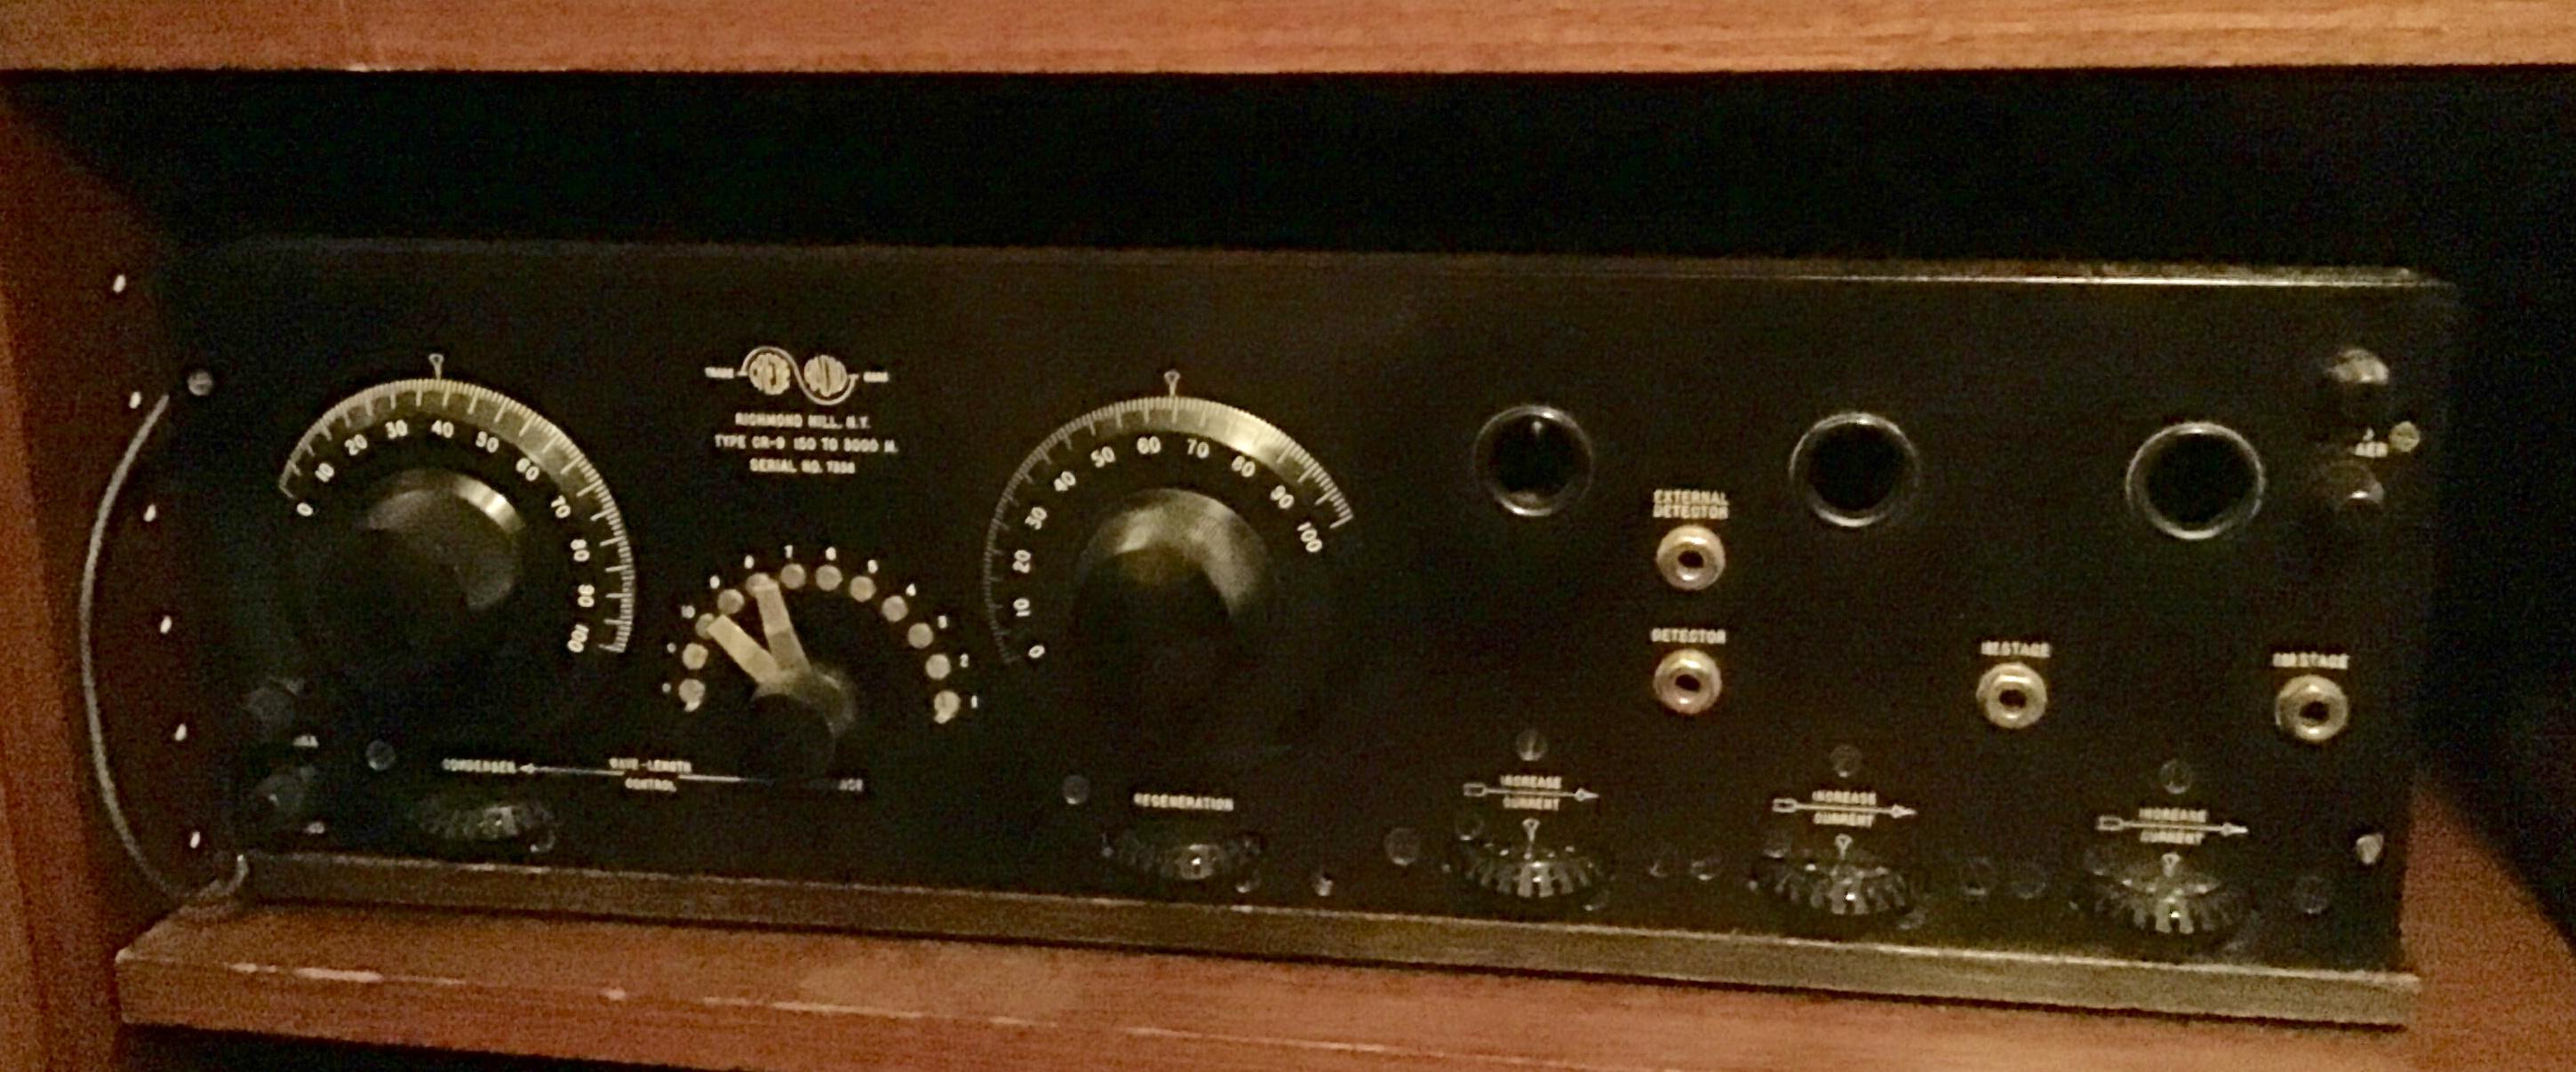 Grebe. Model CR-9